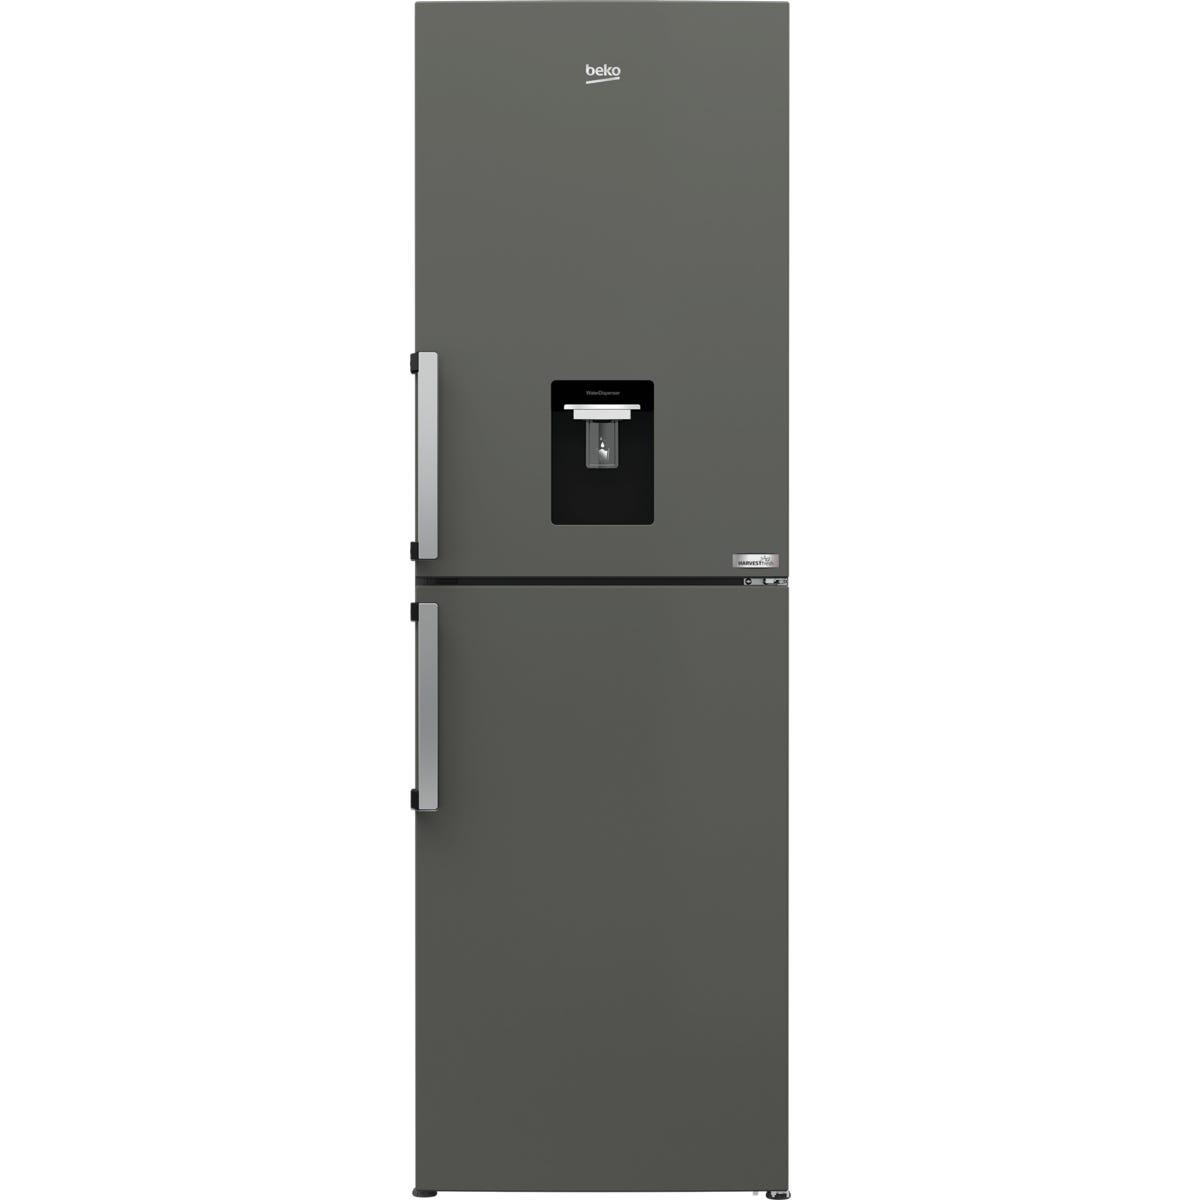 Beko CFP3691DVG 324L Frost Free Combi Fridge Freezer - Graphite